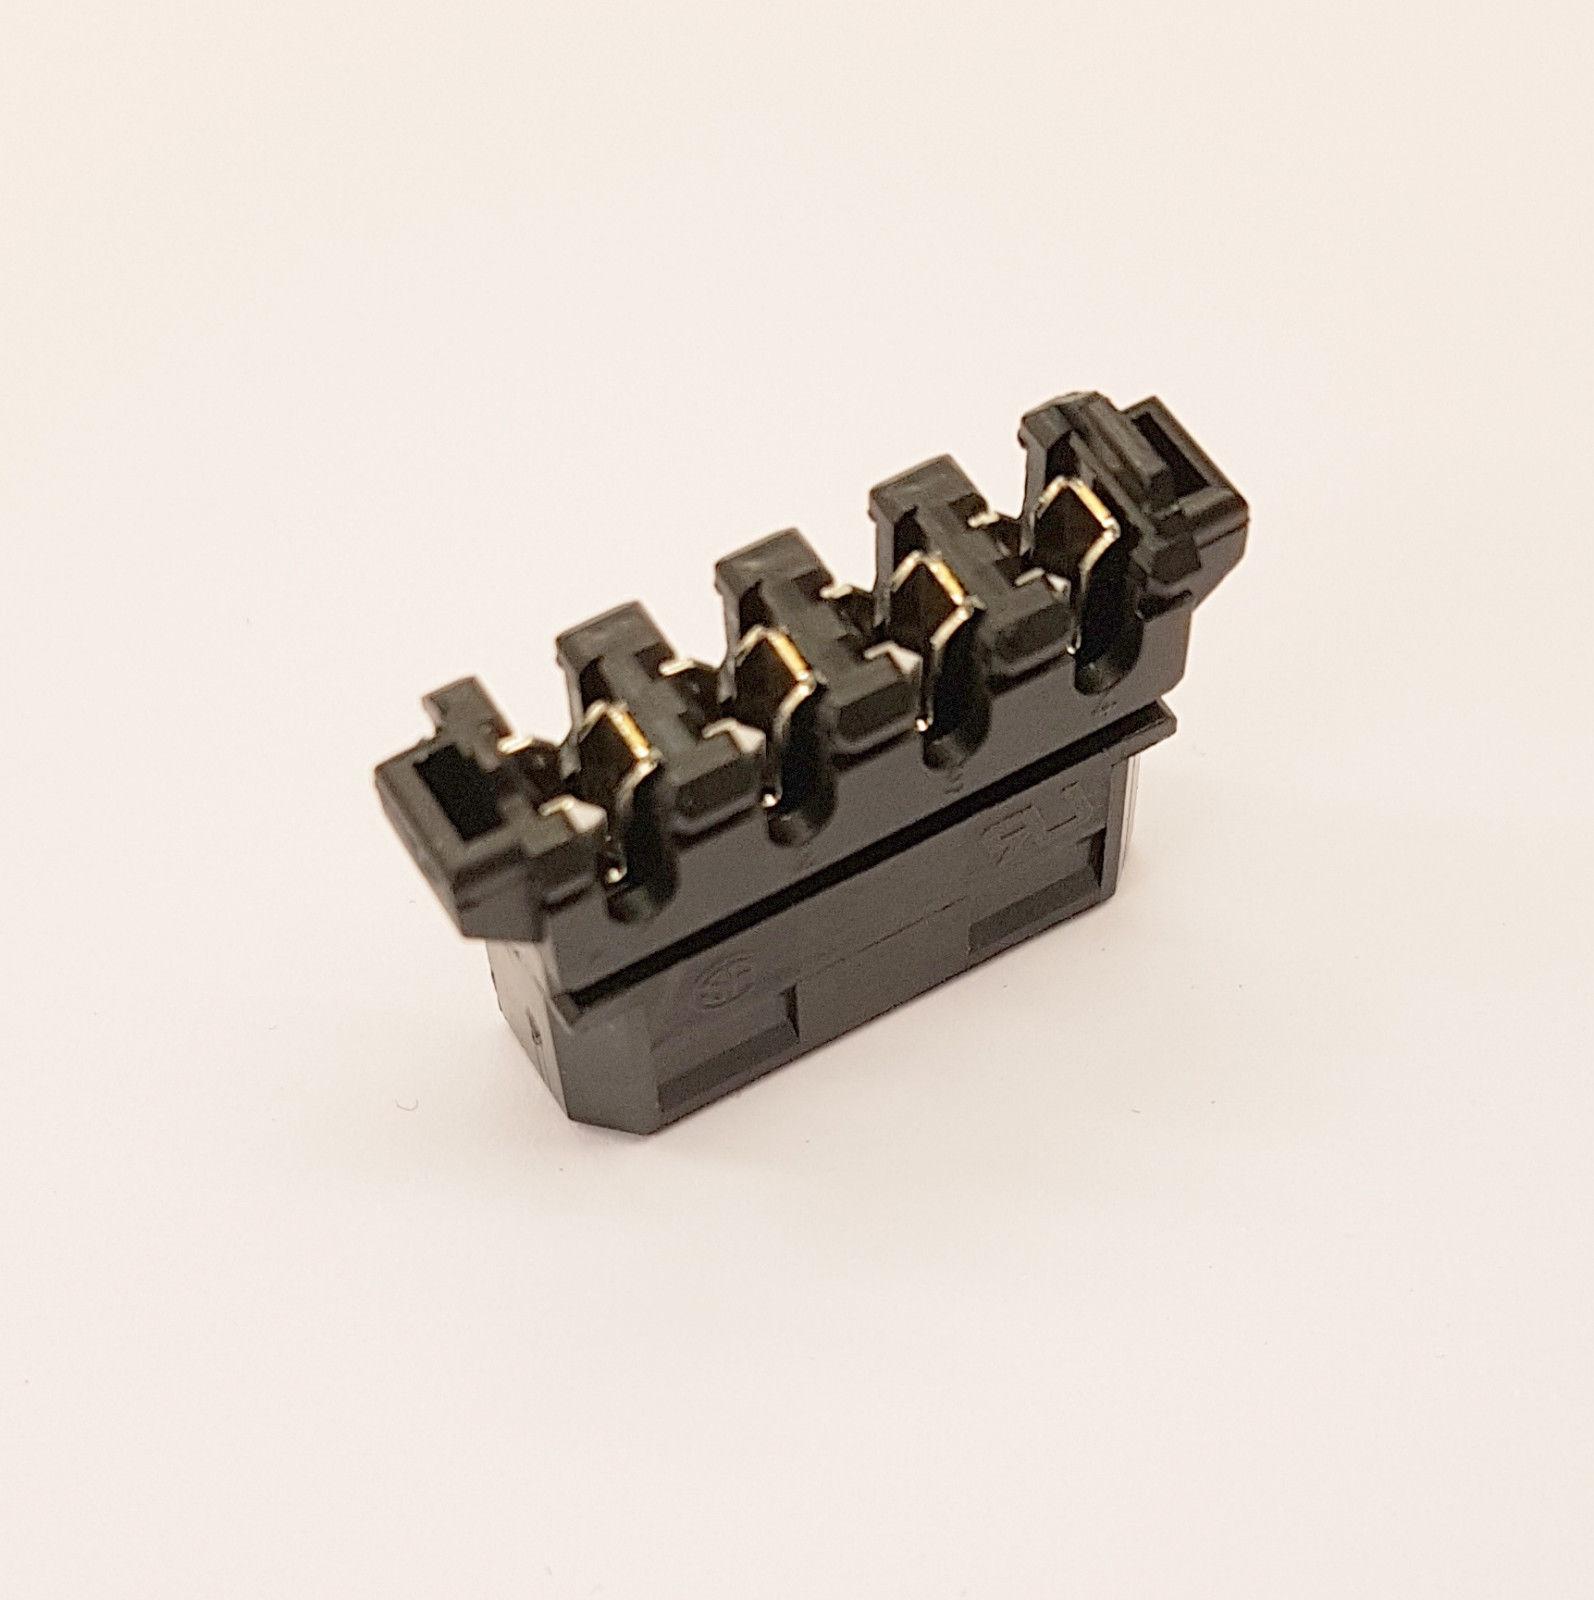 STRAIGHT MOLEX PC PSU POWER SUPPLY CONNECTOR - BLACK INC CAPS - DIY - PK OF 20